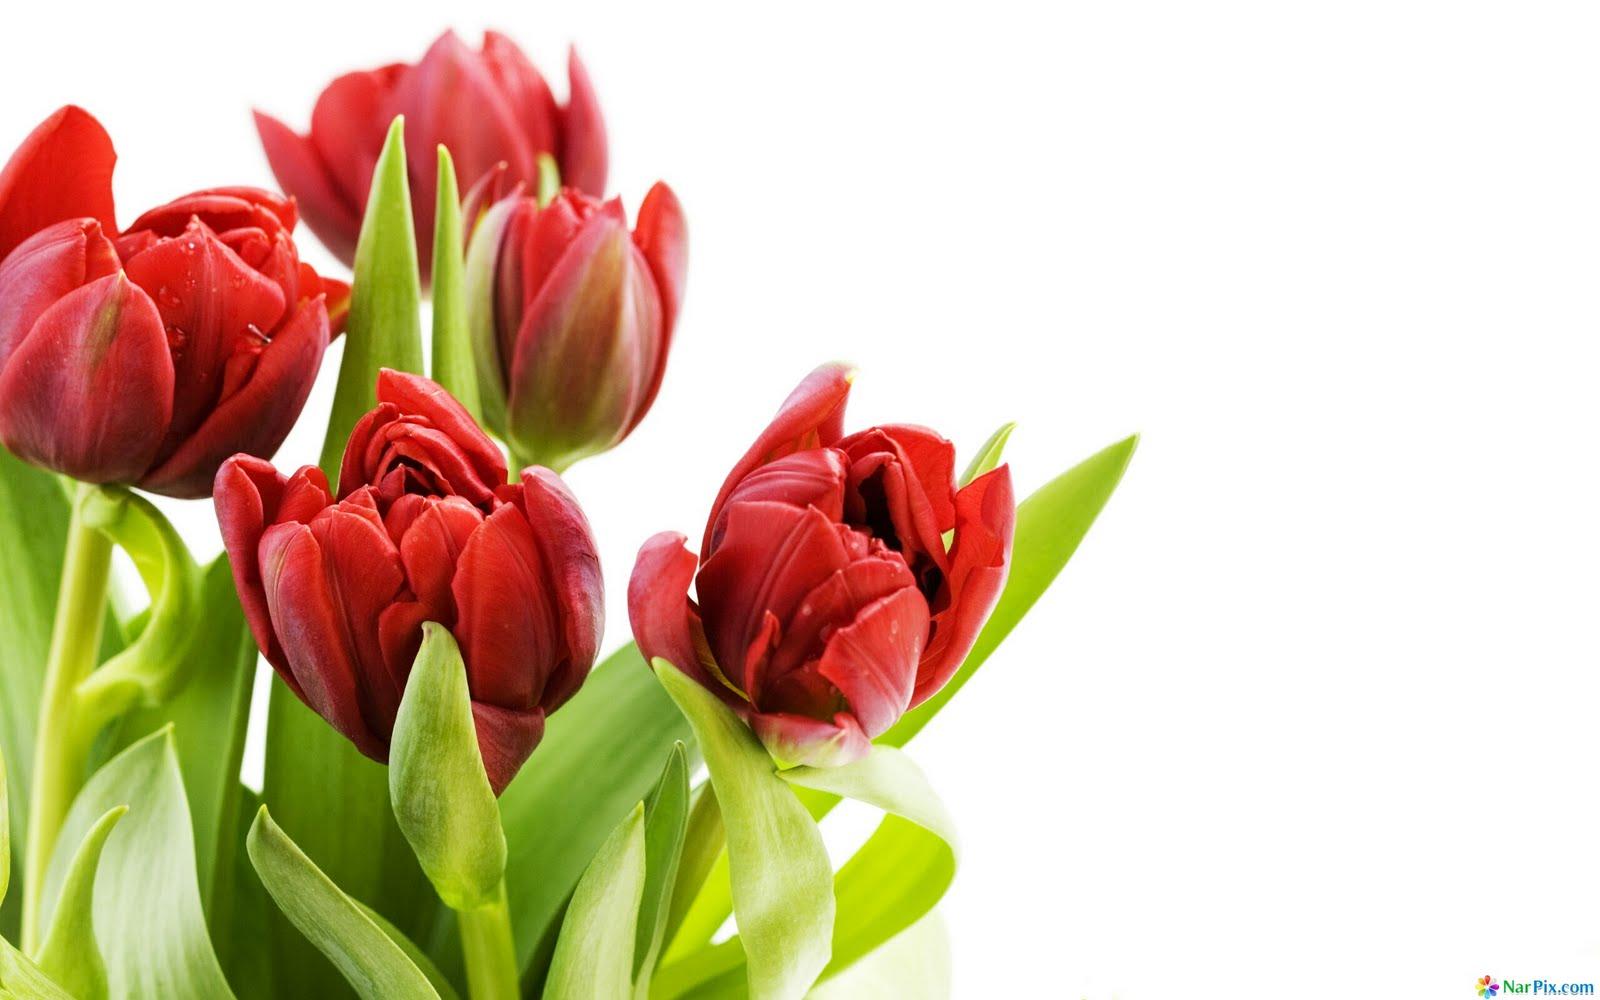 Full Hd Flowers Desktop Wallpaper 1600x1000 pixel Nature HD 1600x1000